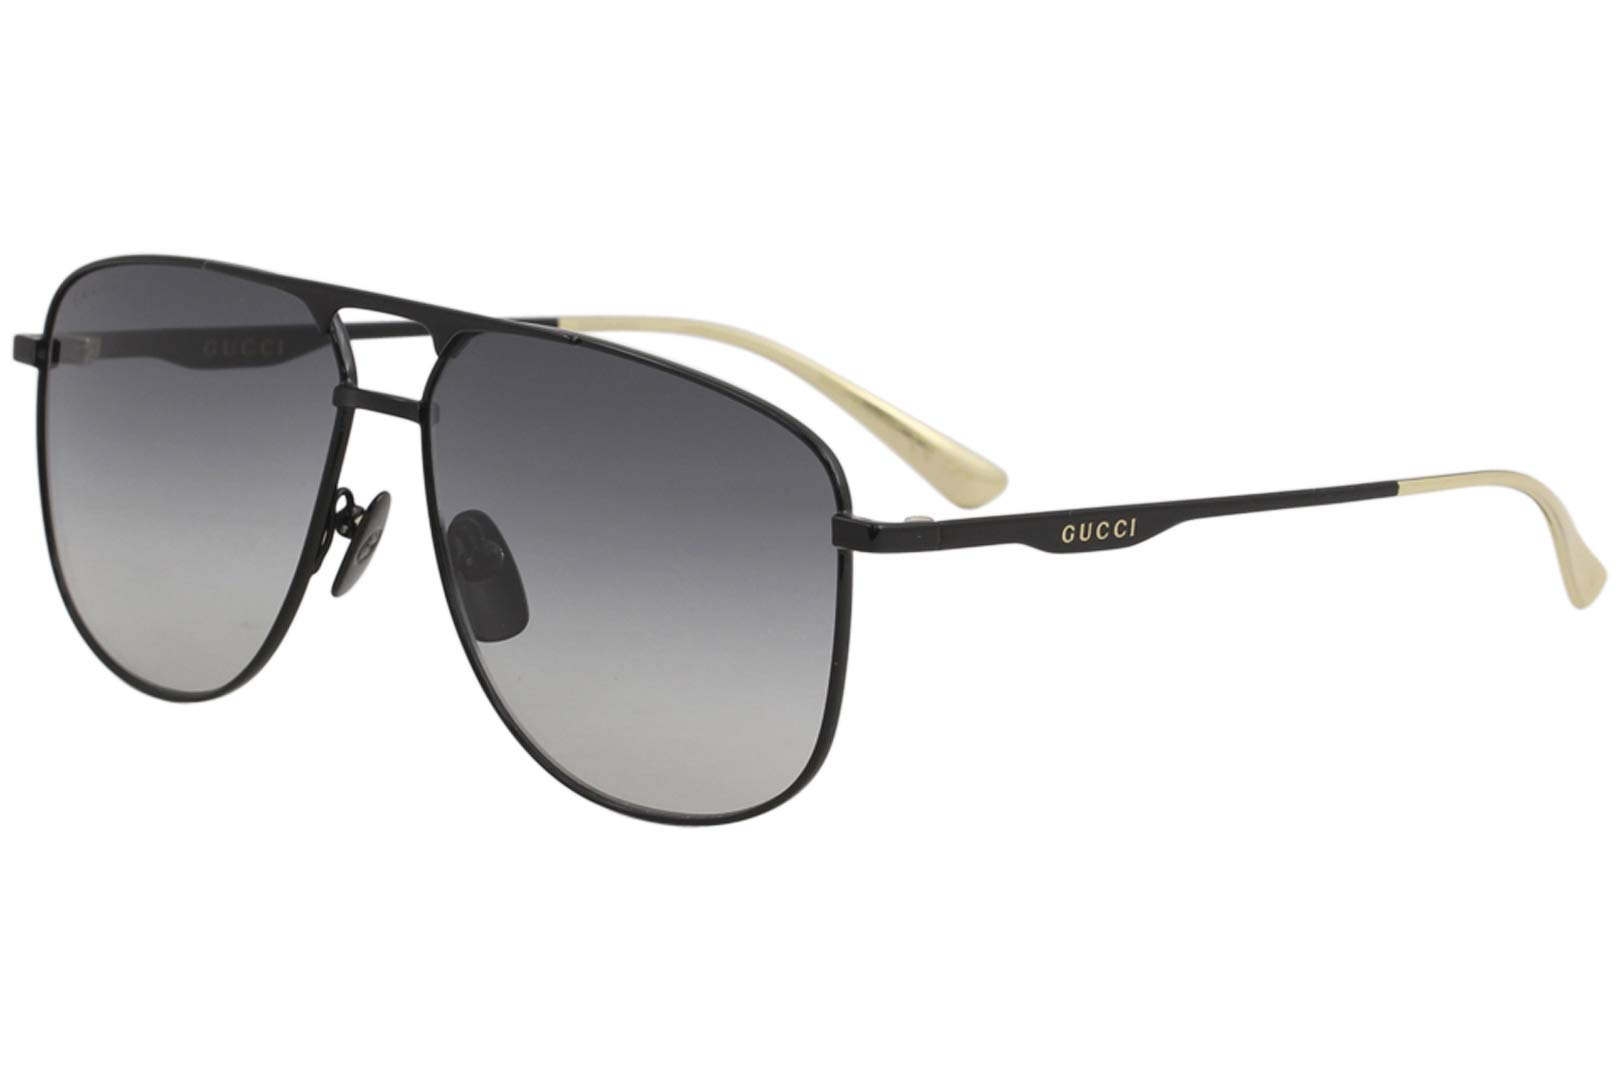 408f7595881 Gucci GG0336S Sunglasses 002 Black Black   Grey Gradient Lens 60 mm